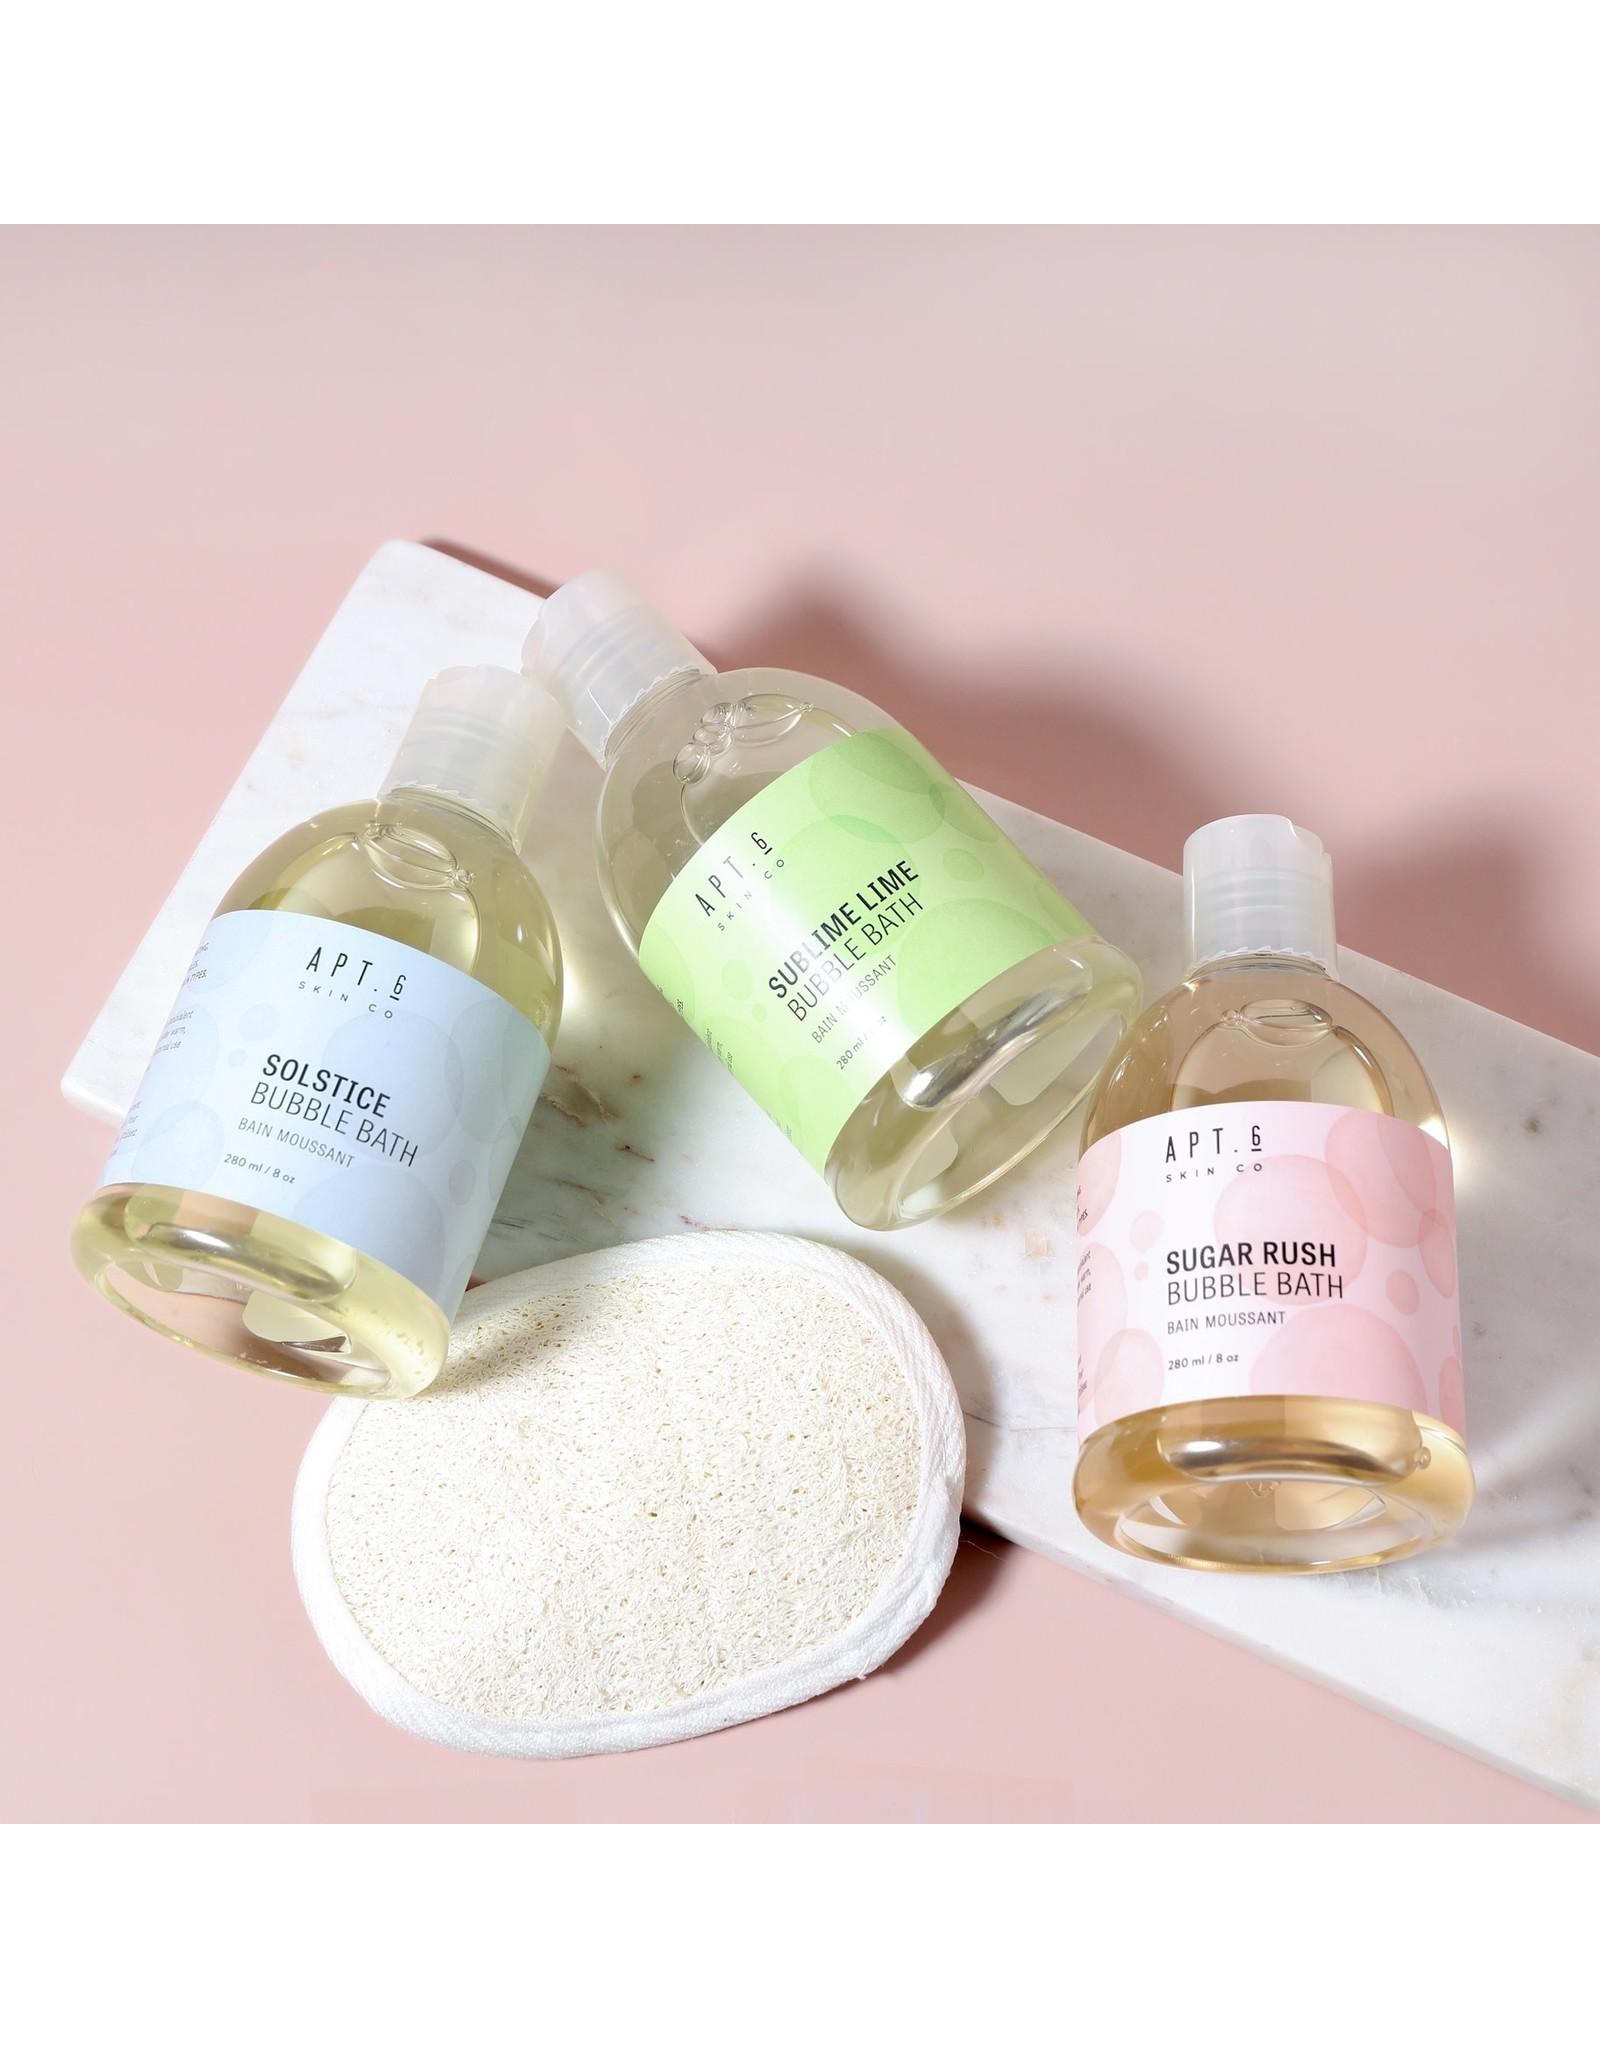 Apt. 6 Skin Co. Bubble Bath | Sugar Rush